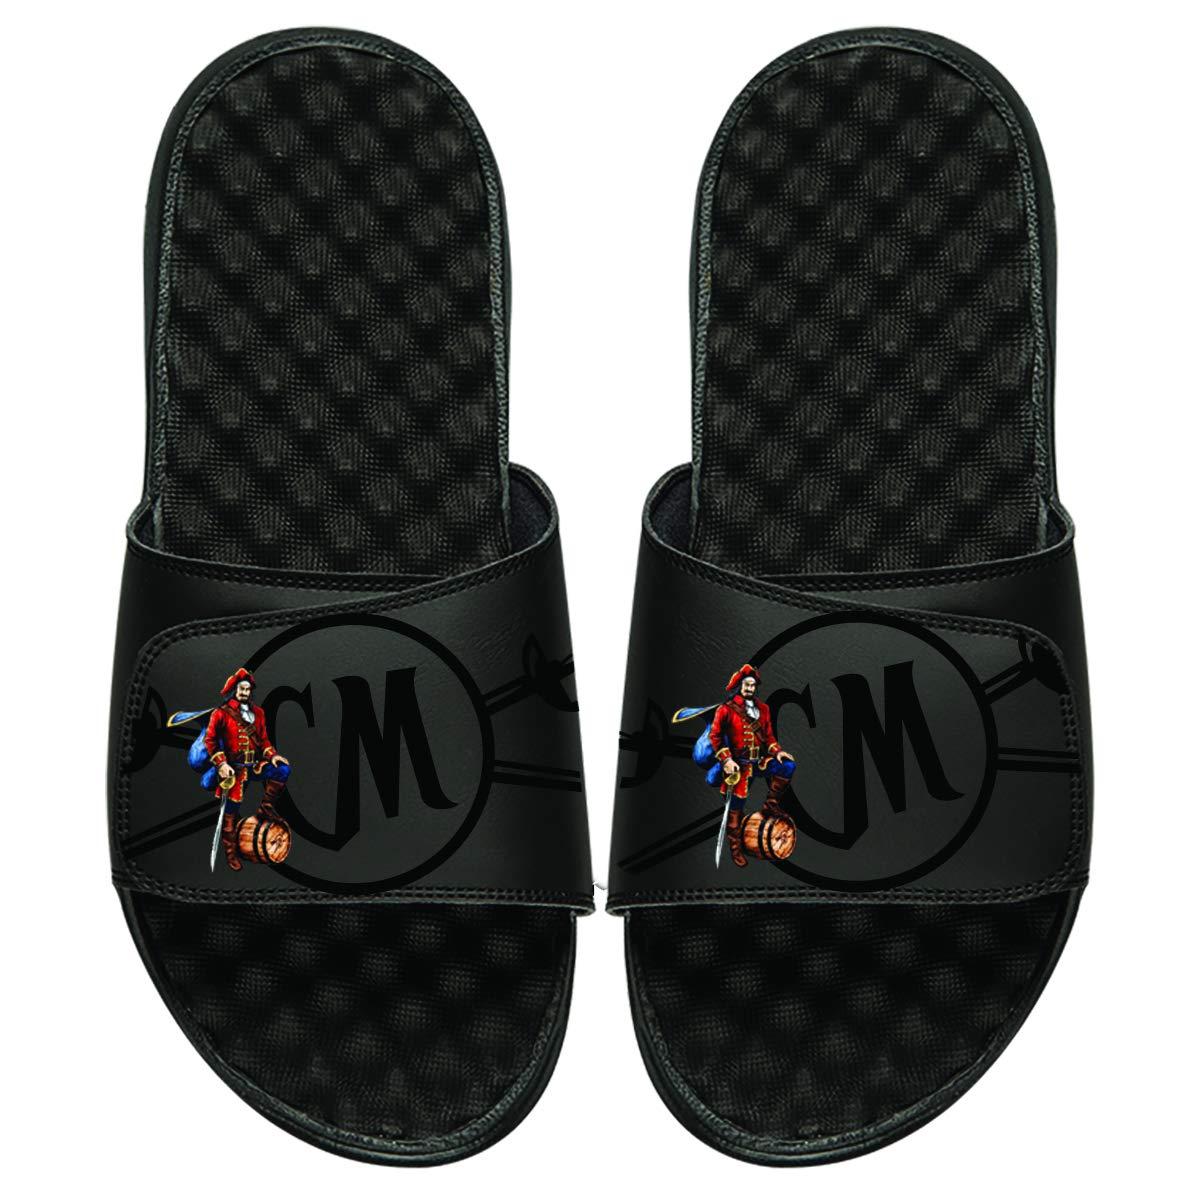 ISlide Mens Captain Morgan Tonal Pop Slippers, Black, 2